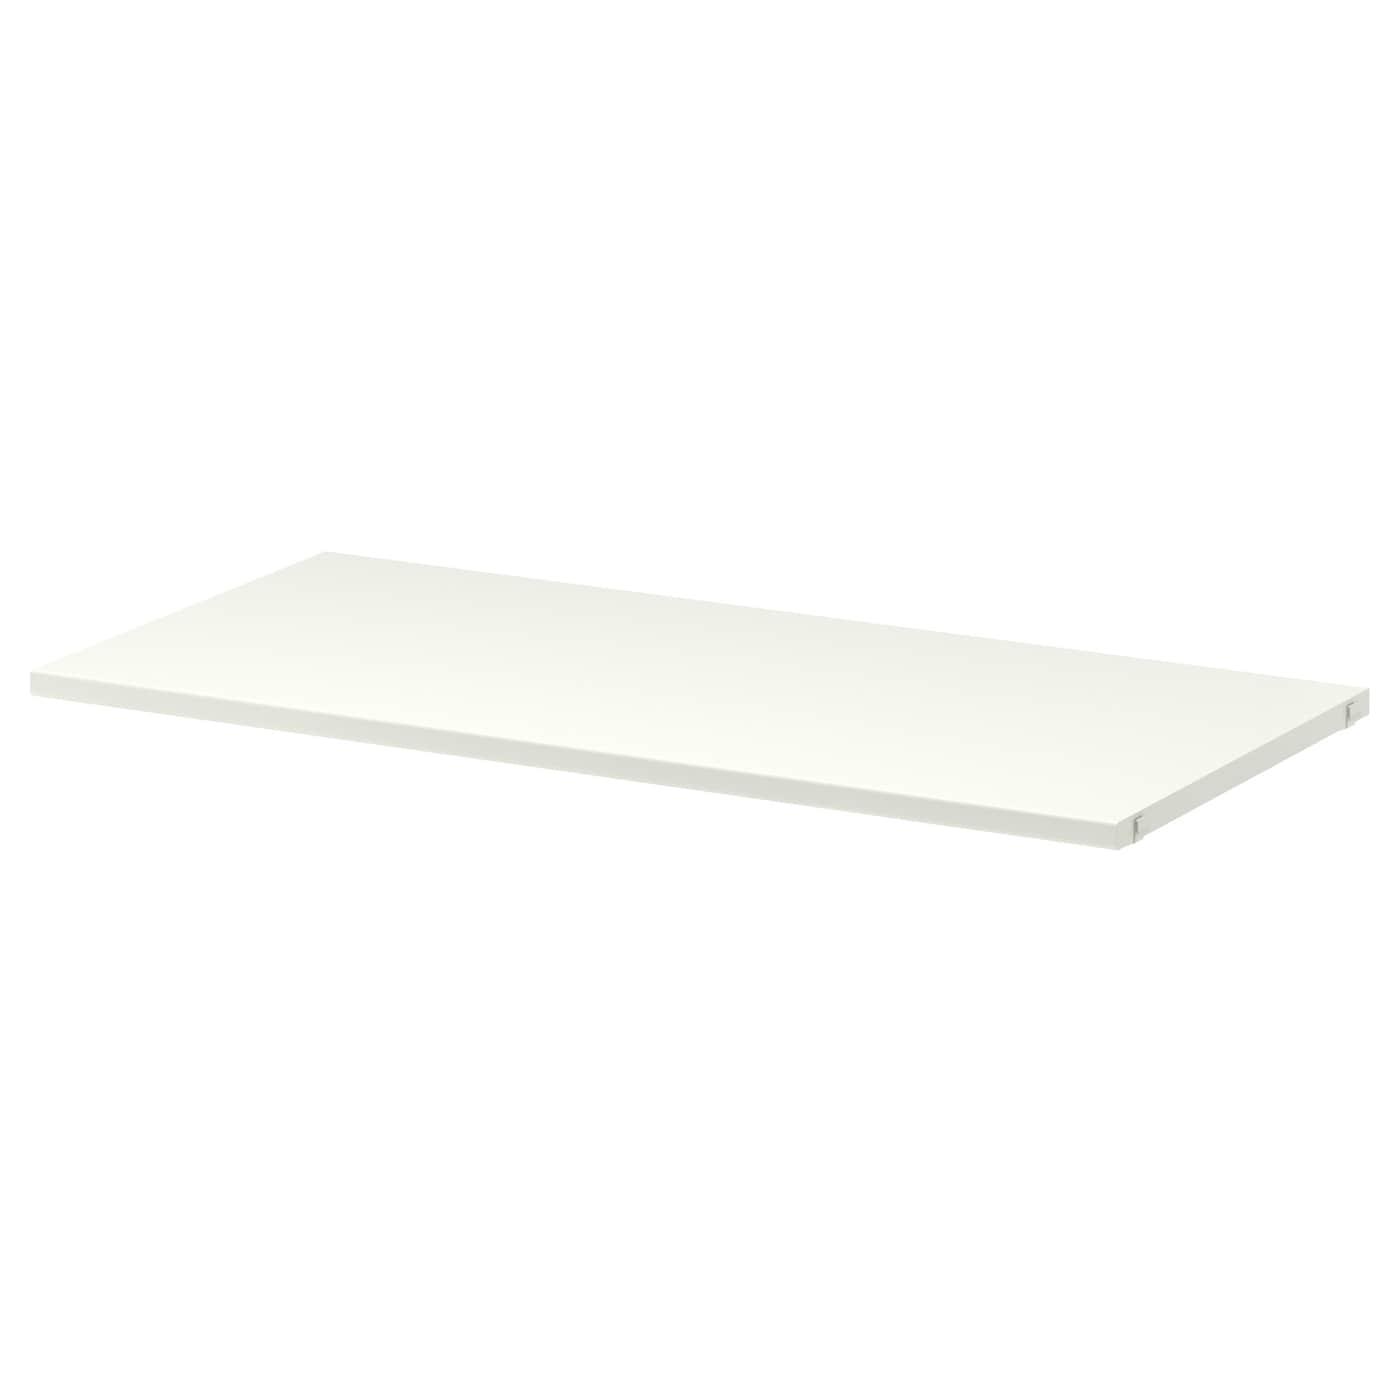 algot tablette blanc 80x38 cm ikea. Black Bedroom Furniture Sets. Home Design Ideas